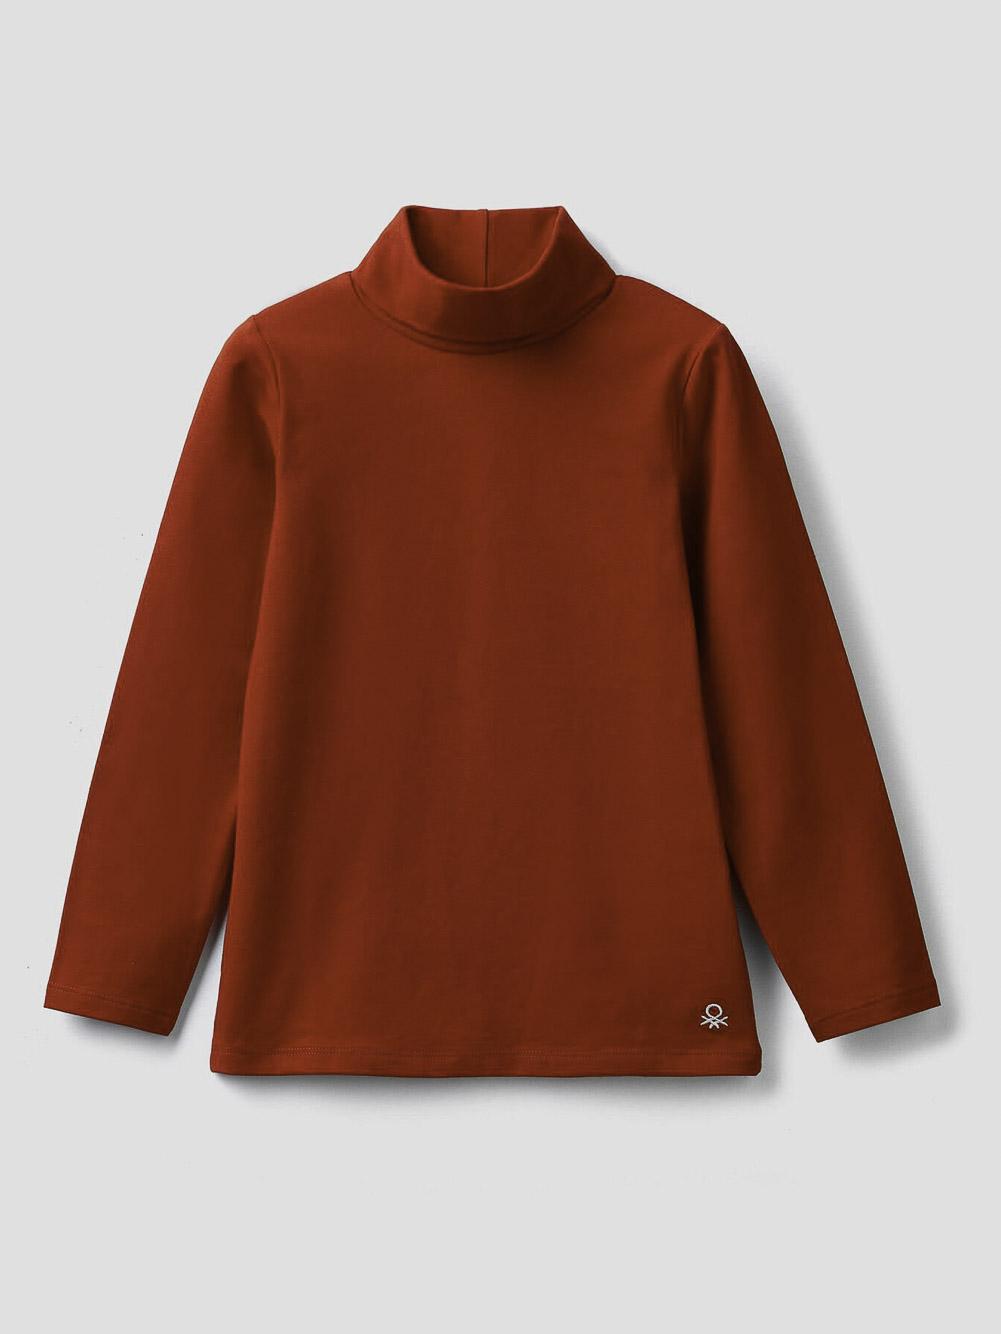 012 BENETTON T-shirt με γιακά ζιβάγκο 3P4ZC2193 20A015